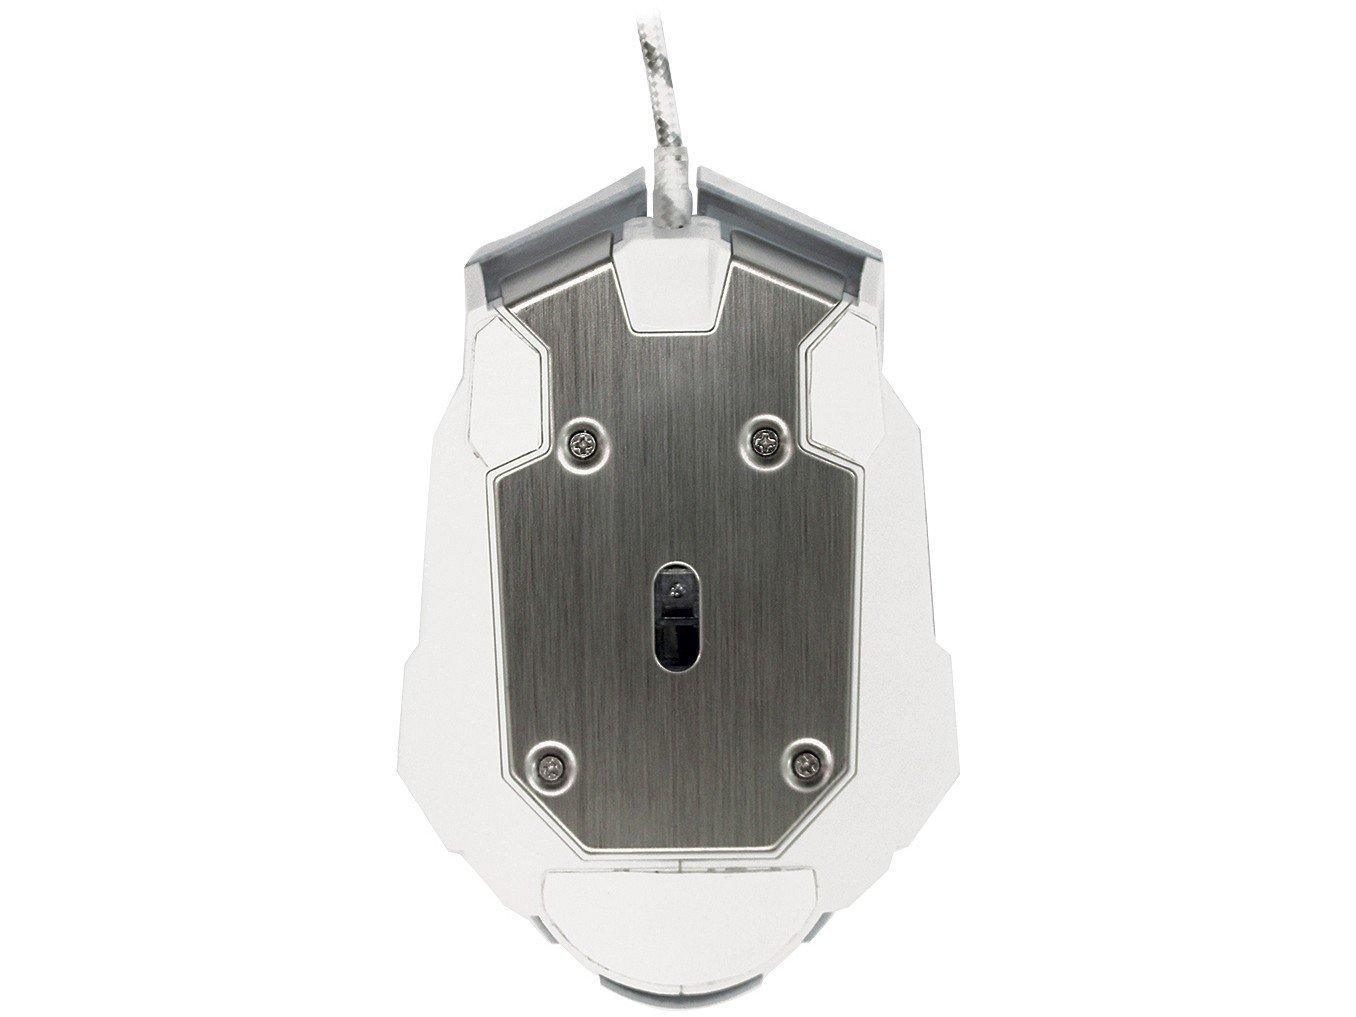 Foto 2 - Mouse Gamer Sensor Óptico 4000dpi OEX - Robotic MS308